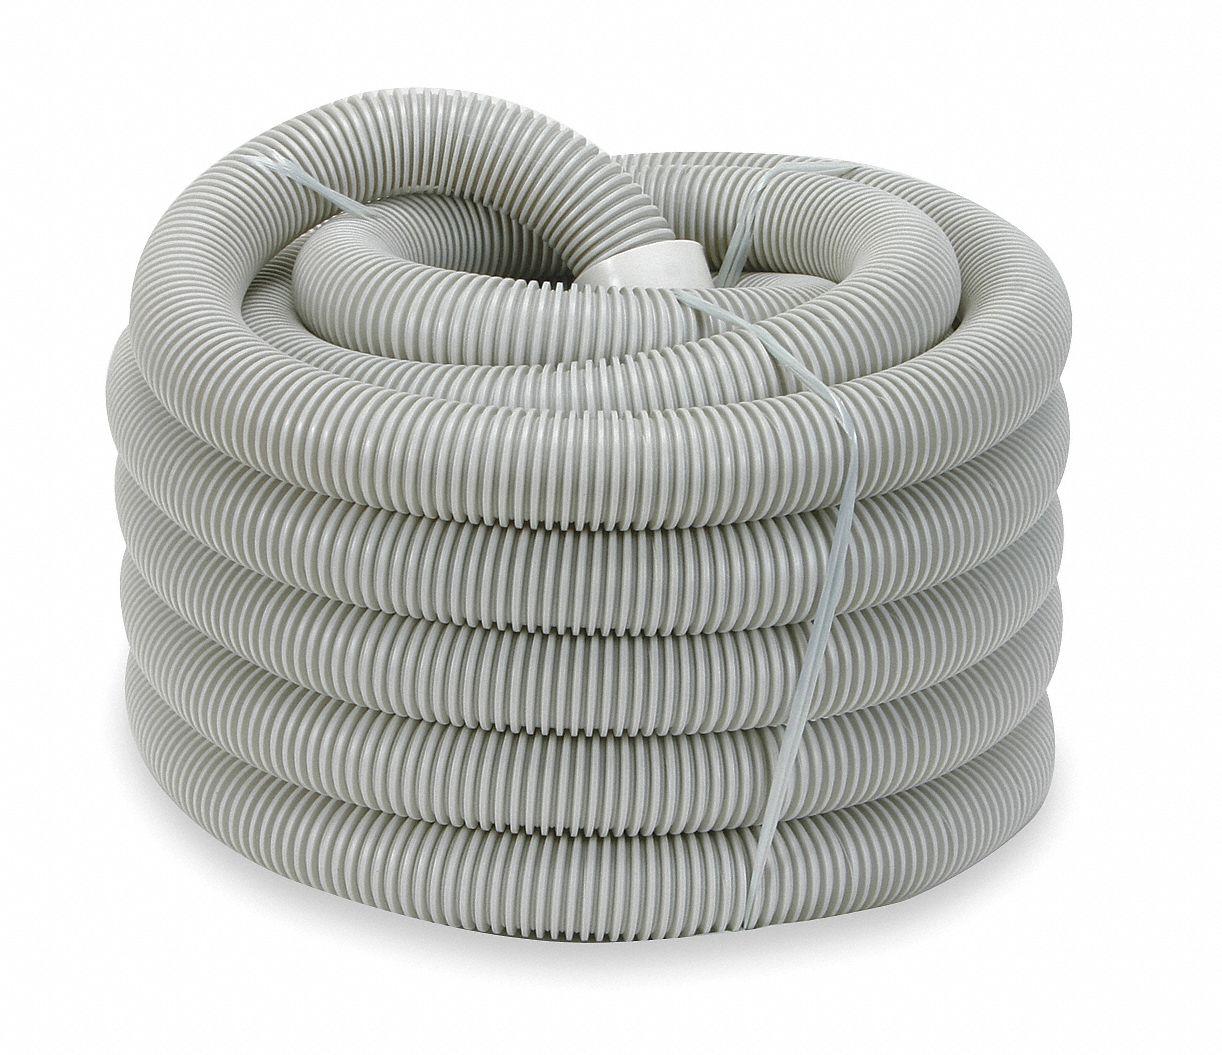 Walmart Plumbing Flexible Prop : Grainger approved — handle vacuum hose white ztw